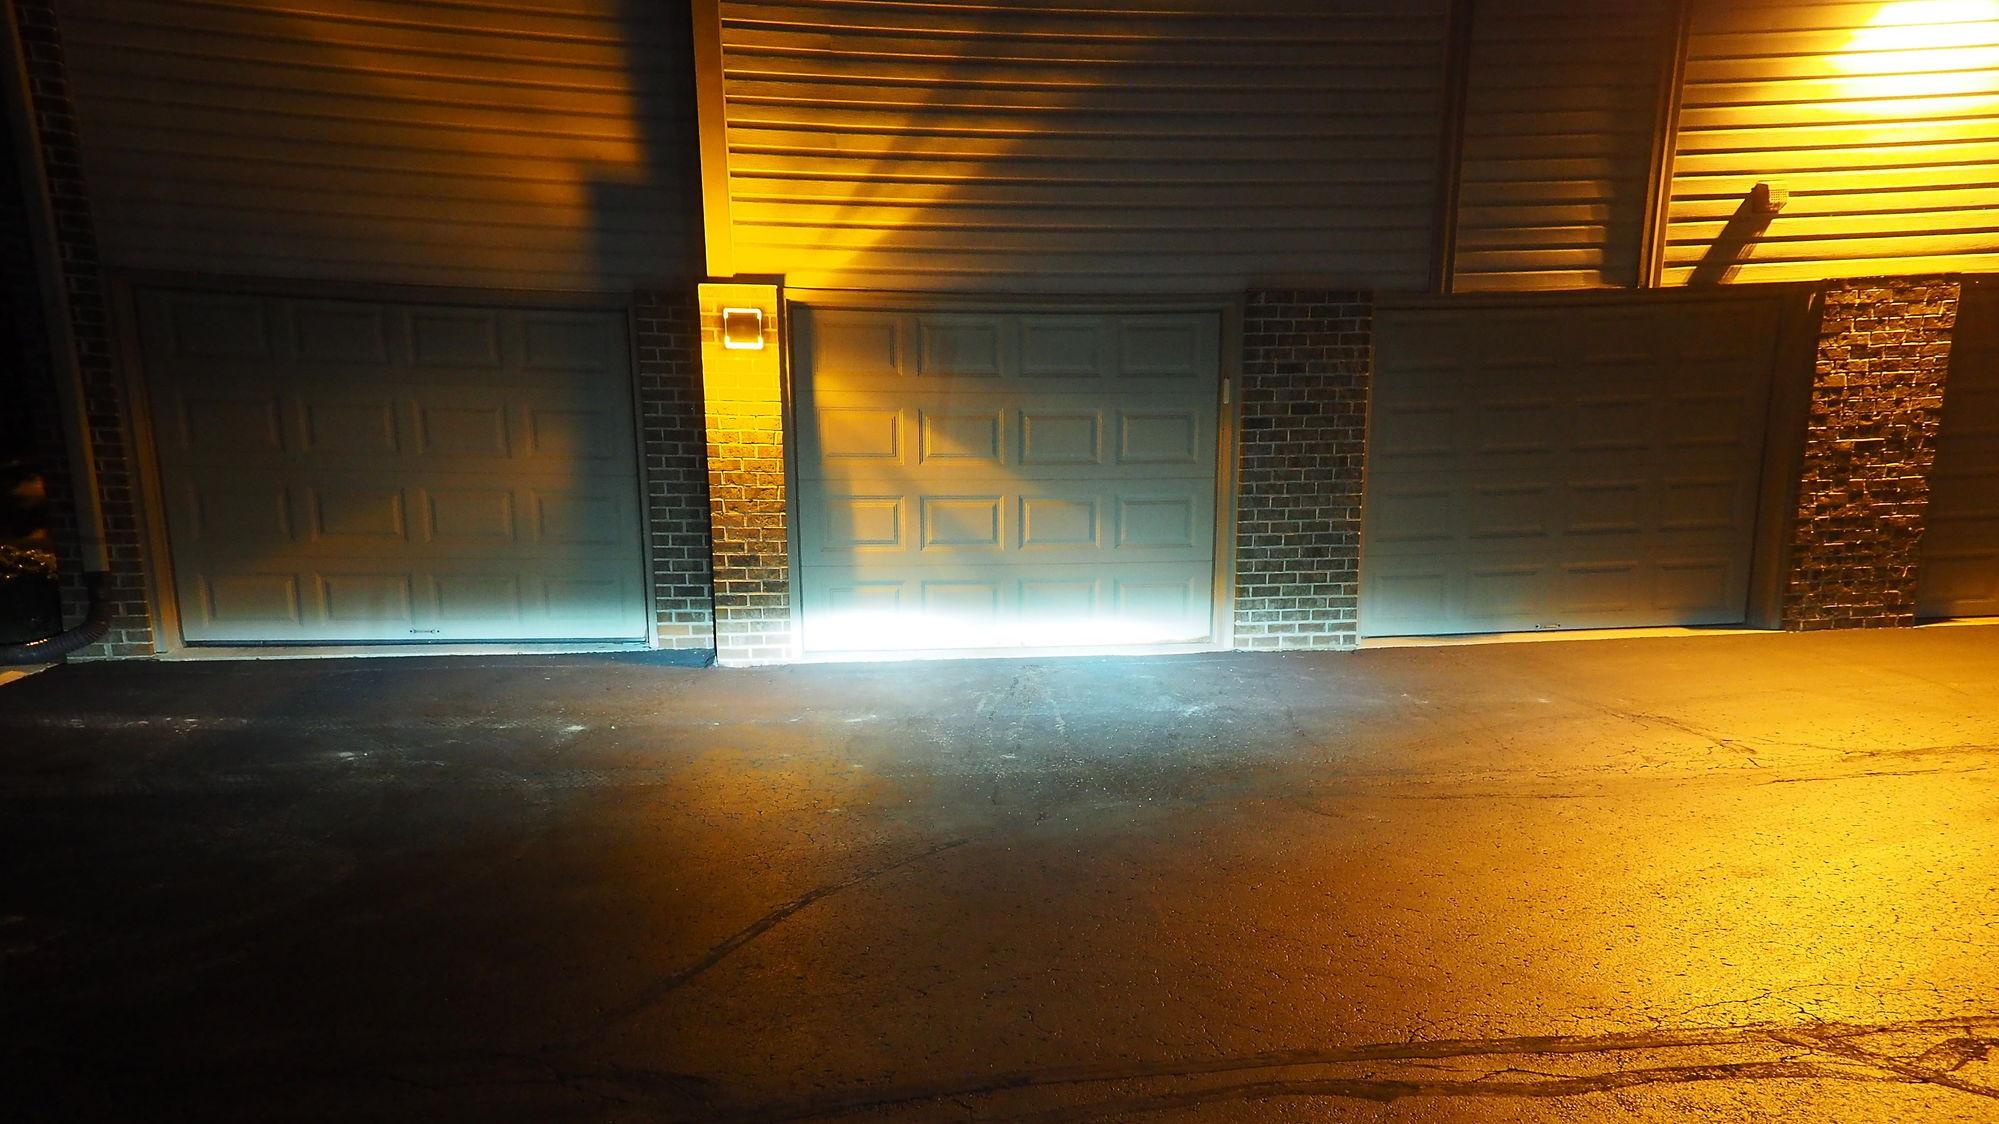 brightest led headlight bulbs for